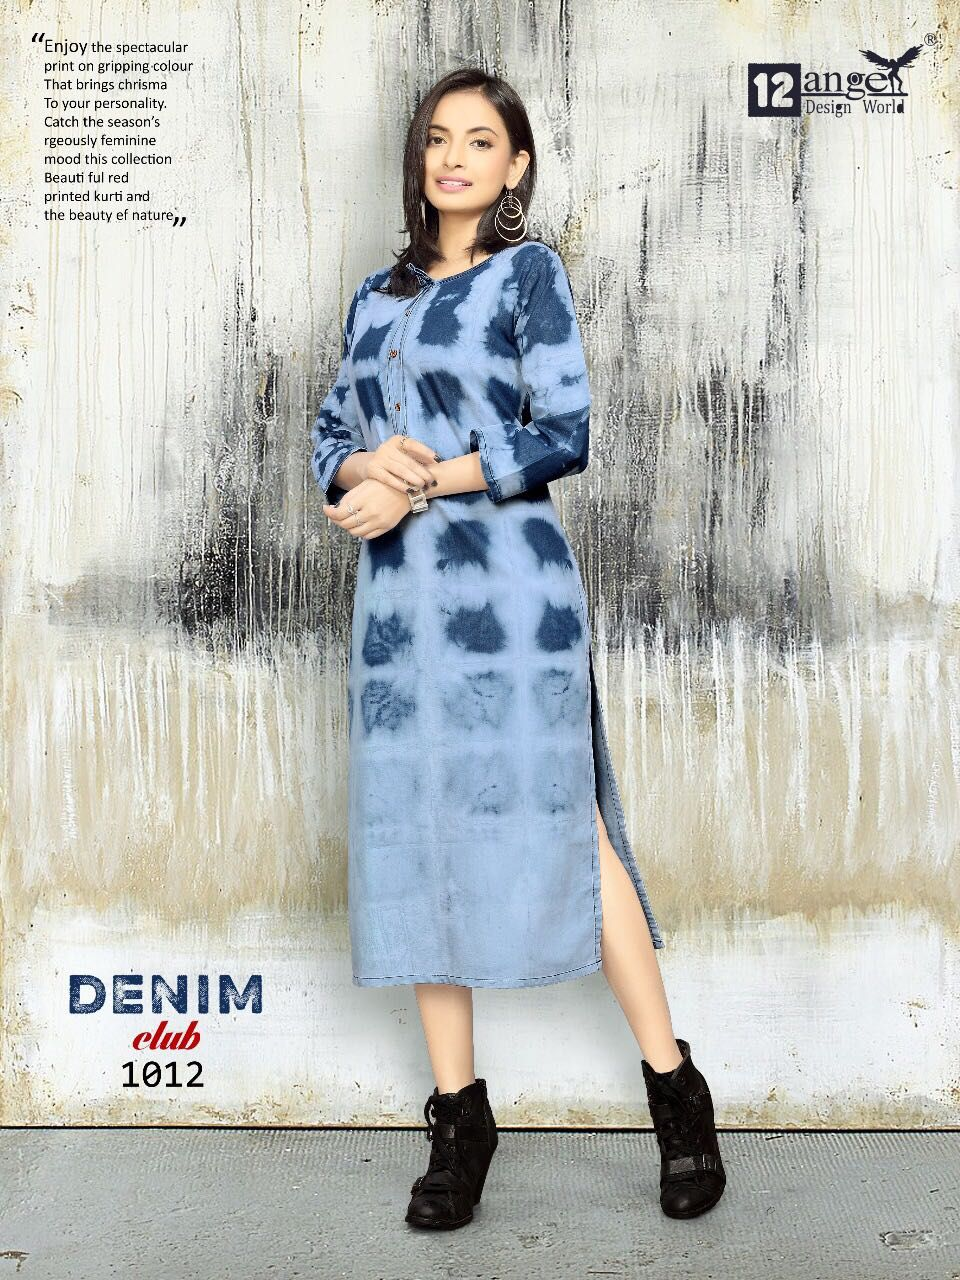 84a832e913 Brand- 12  Angel Catalog- DENIM CLUB Type.. Long Kurti Series-1001 to 1012  Fabric.. Original  cotton  Denim With..  Washing effect Length..46 inc  Sizes.